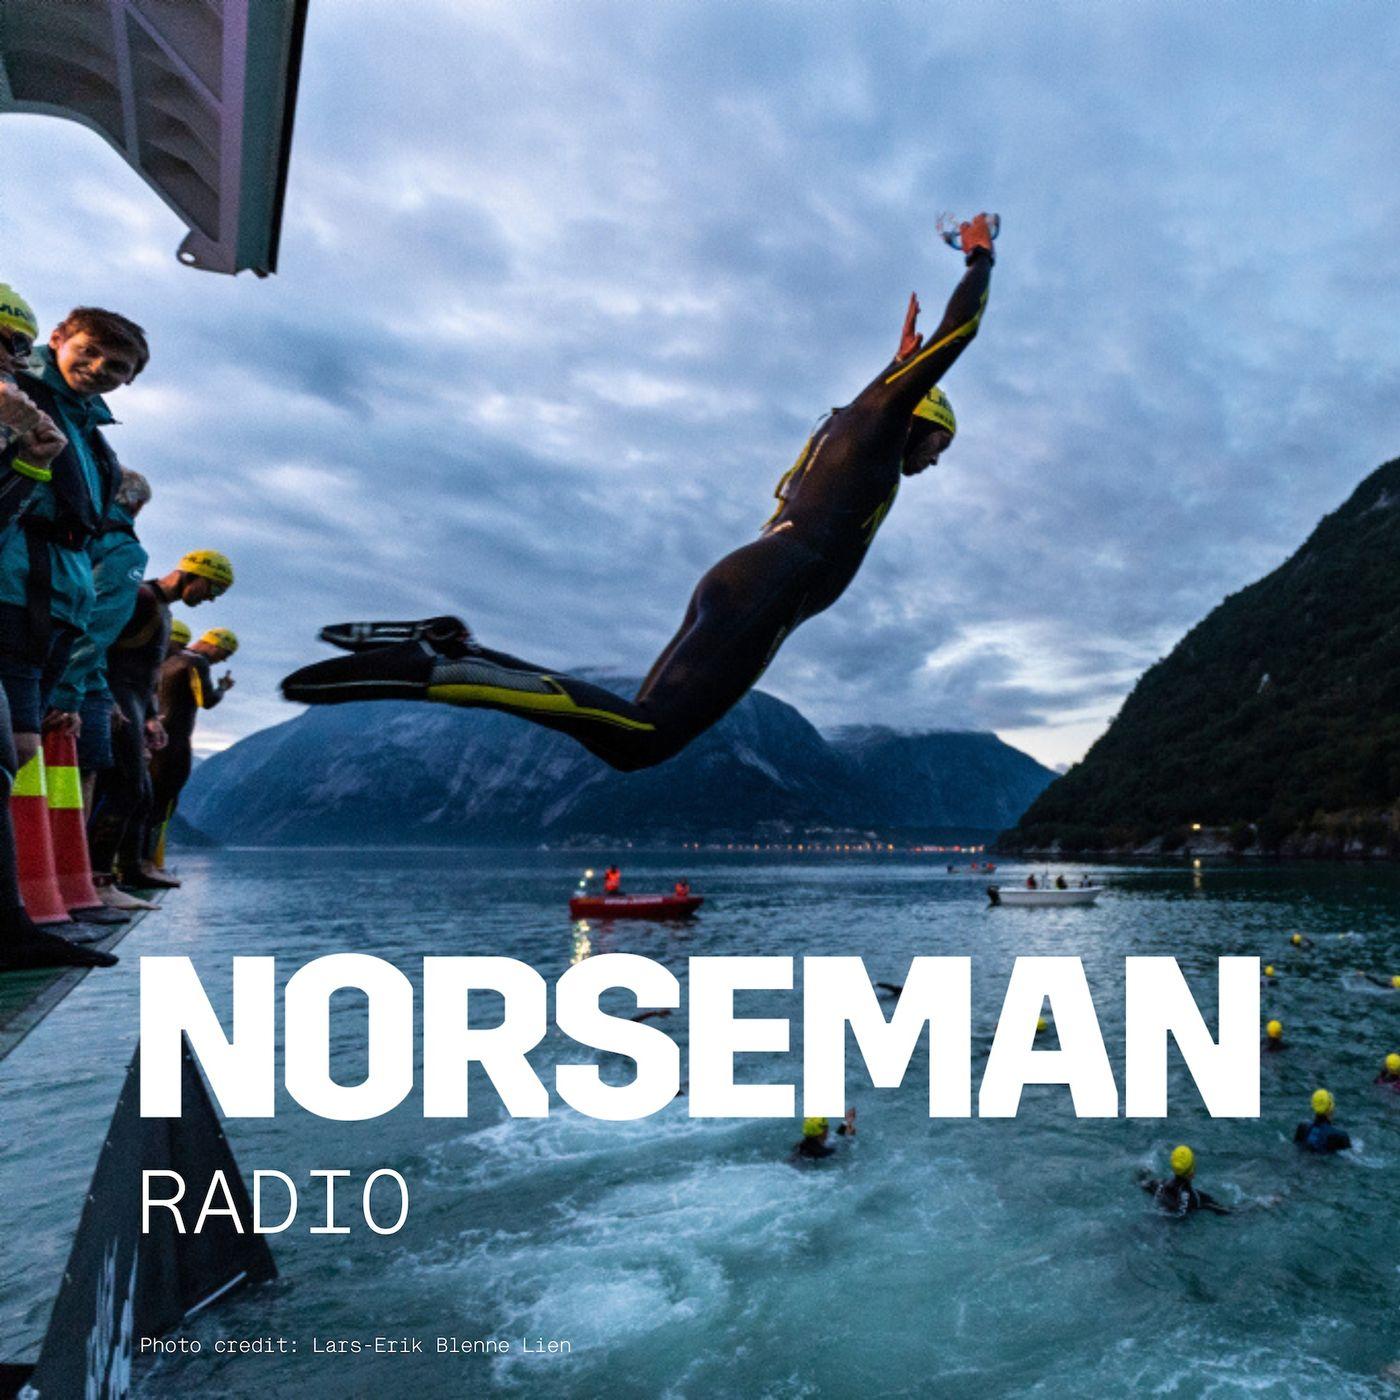 How the Norseman Xtreme Triathlon began with founder Hårek Stranheim